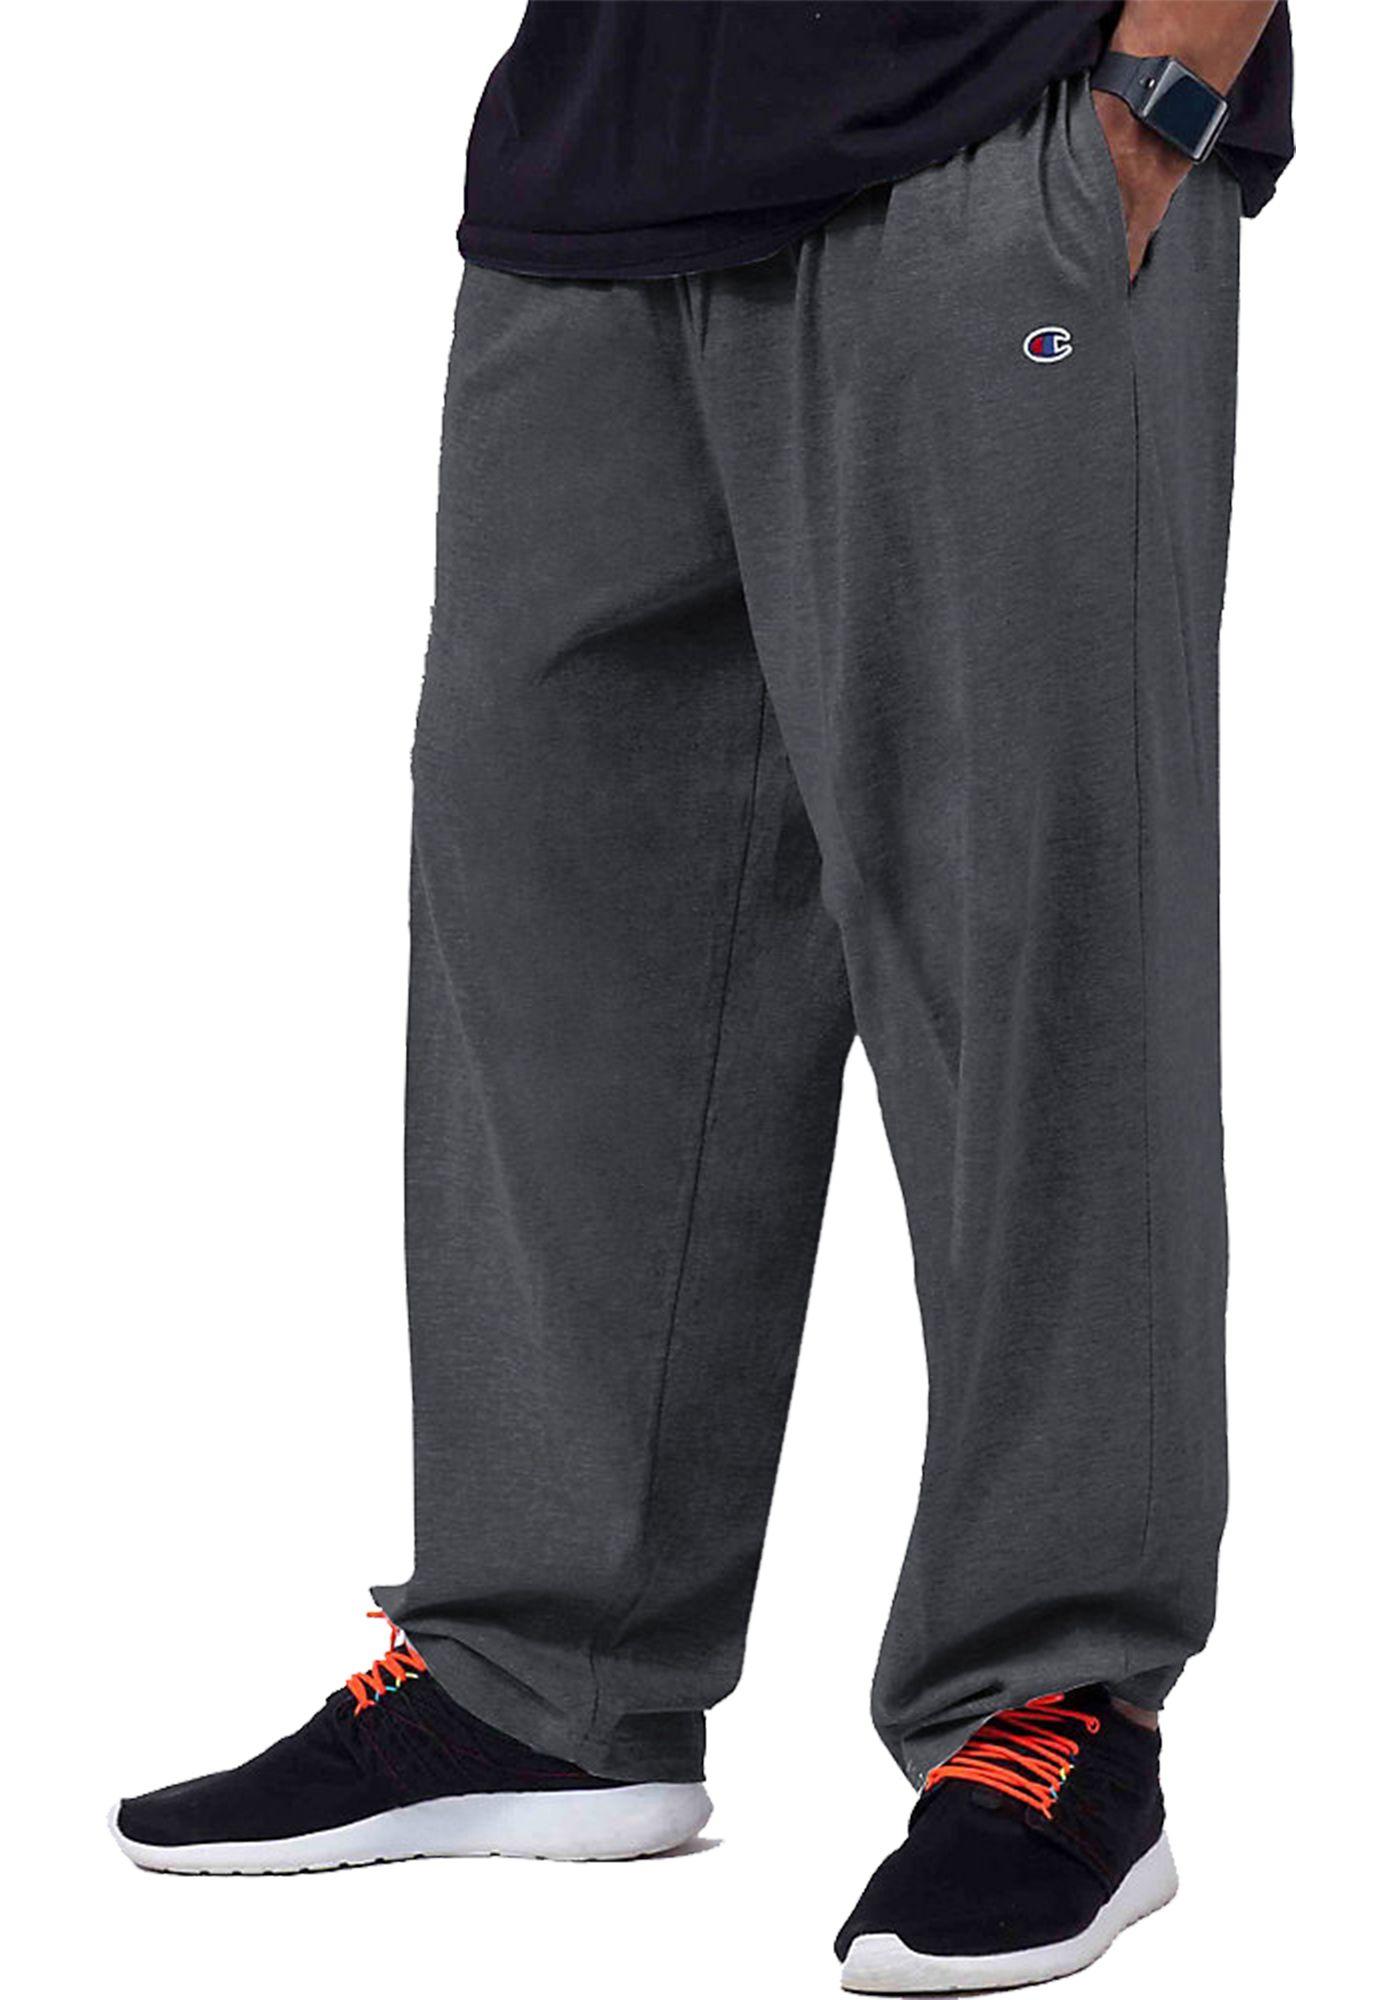 Champion Men's Big & Tall Jersey Pants (Regular and Big & Tall)